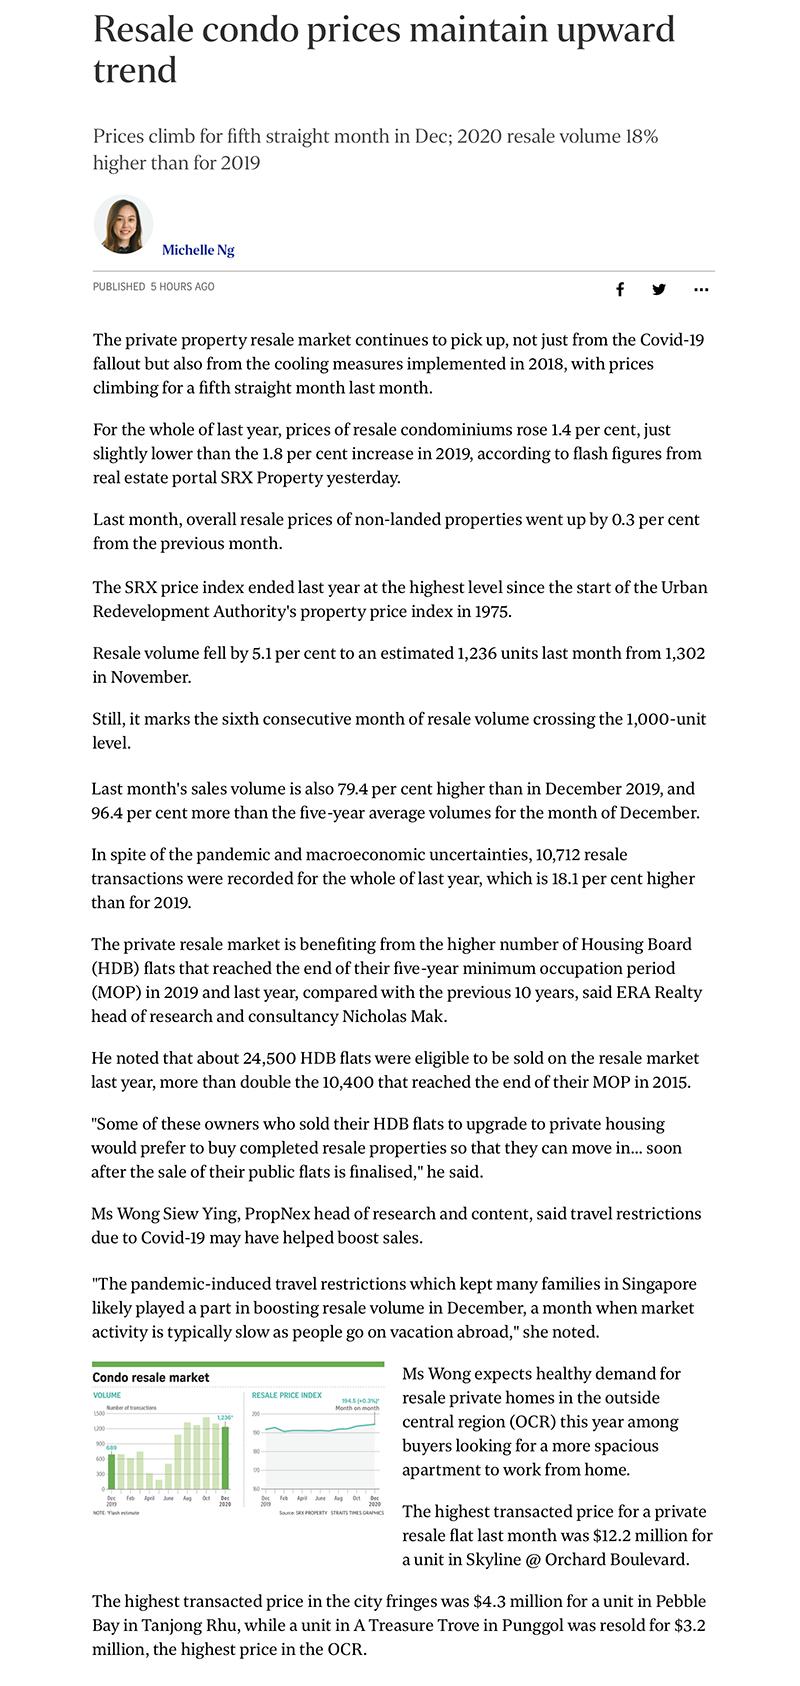 Klimt Cairnhill - Resale condo prices maintain upward trend